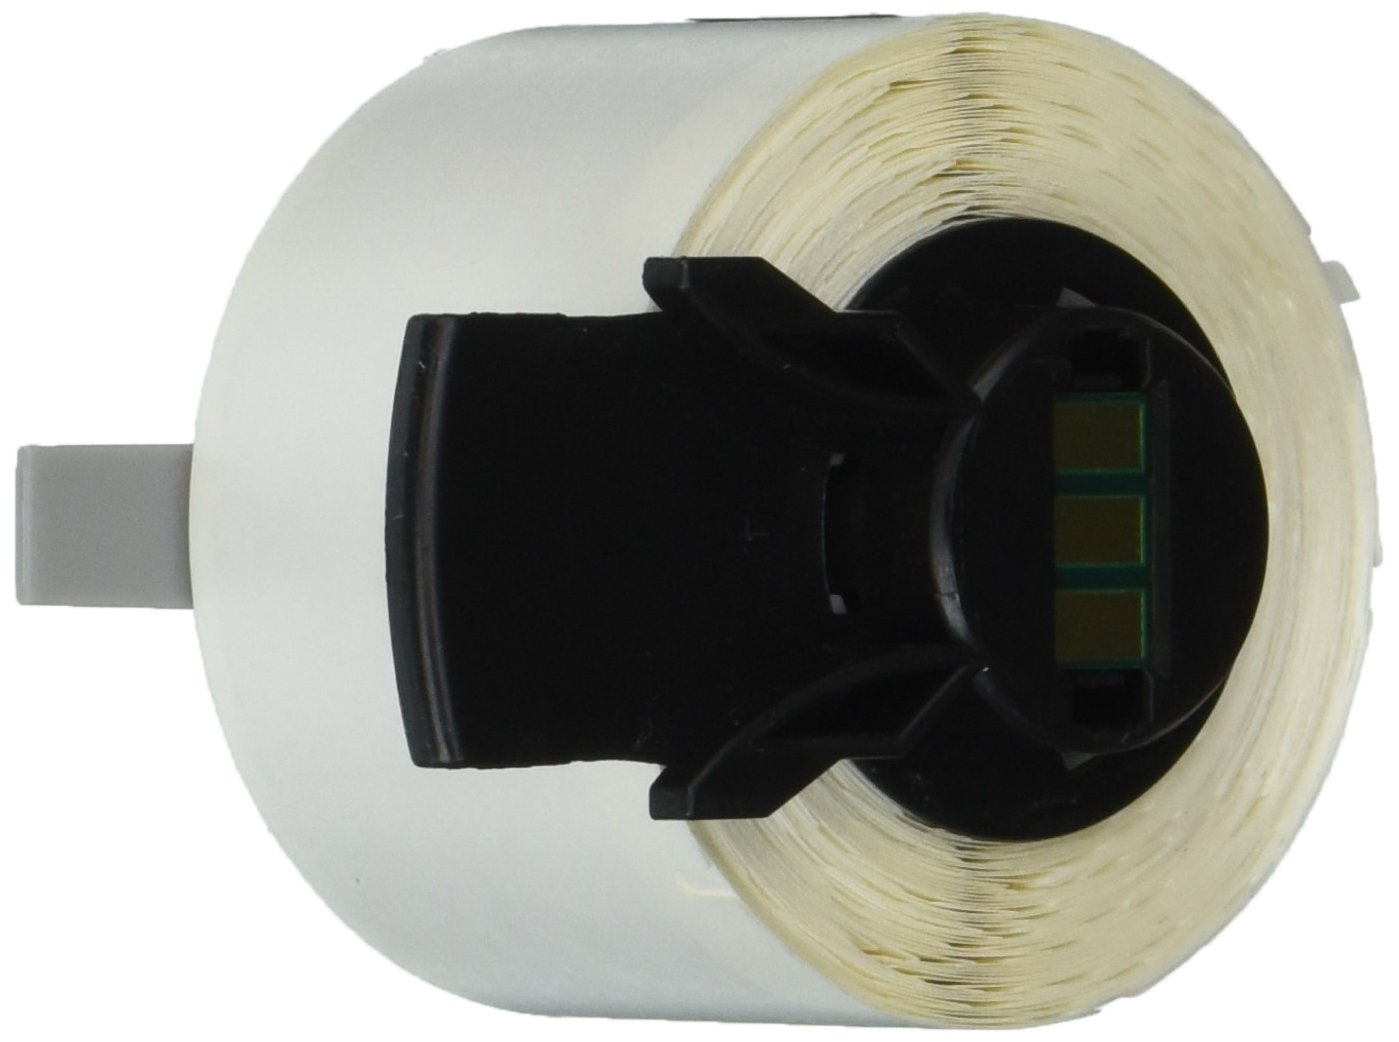 Brady PTL-88-427 TLS 2200 and TLS PC Link 1.75 Width x 1.5 Height 250 per Roll B-427 Self-Laminating Vinyl Matte Finish White//Translucent Label